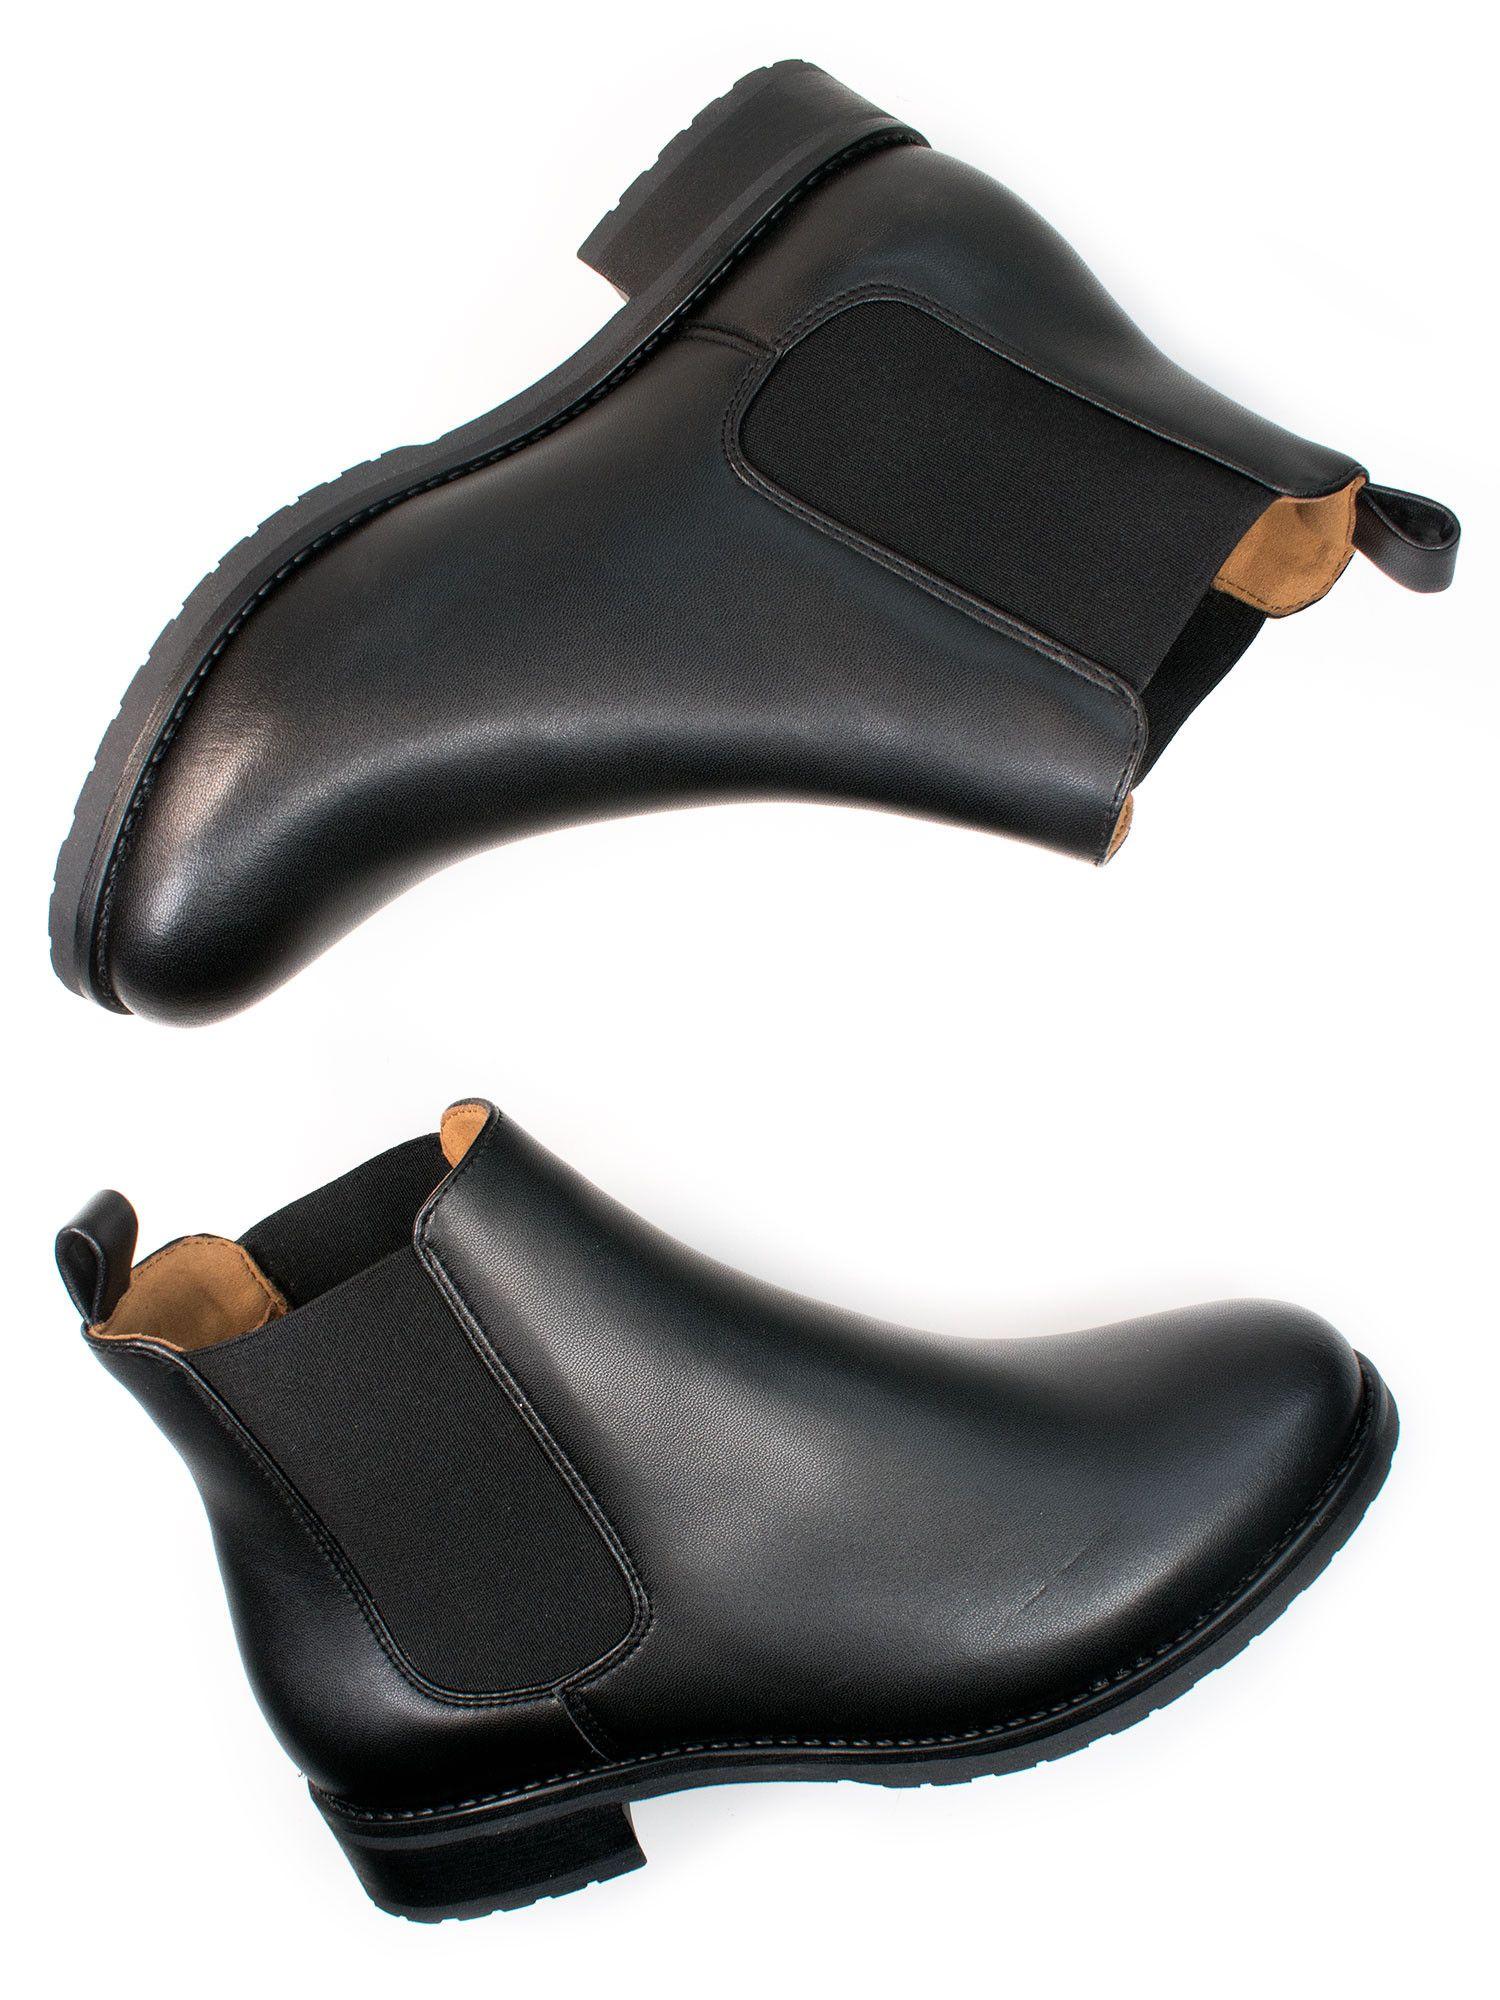 Luxe Smart Chelsea Boots Chelsea Boots Boots Vegan Shoes